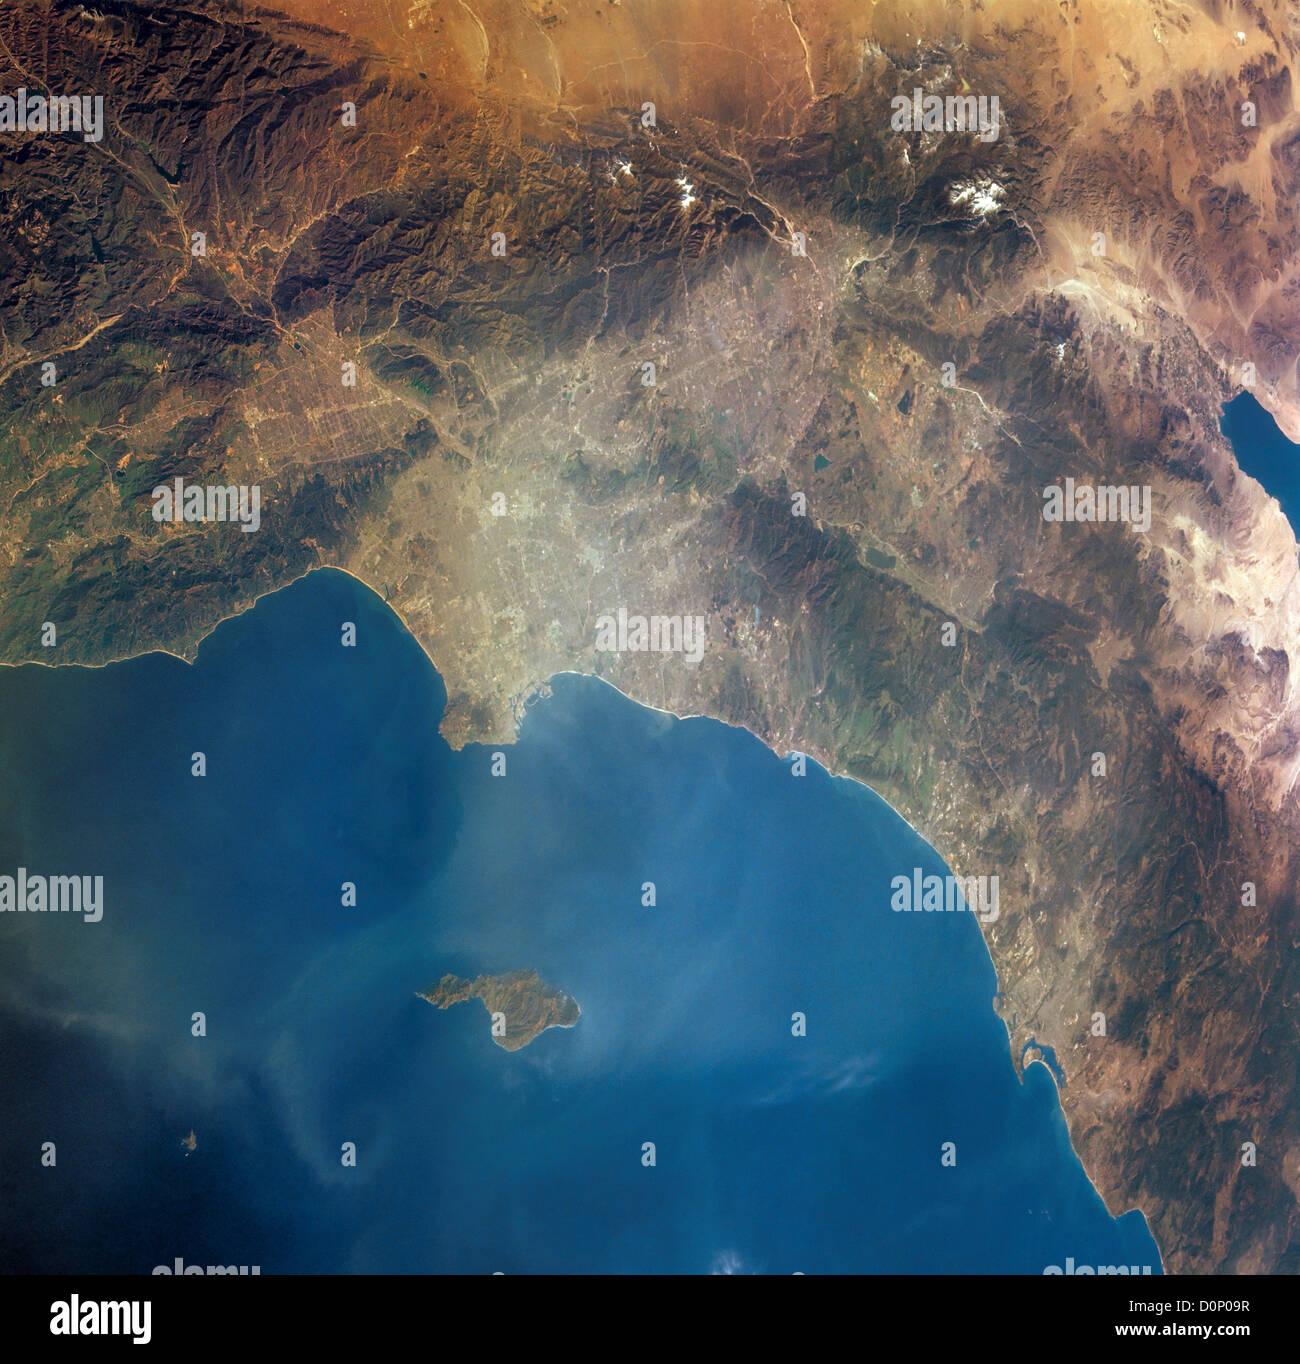 Los Angeles and San Diego Smog - Stock Image